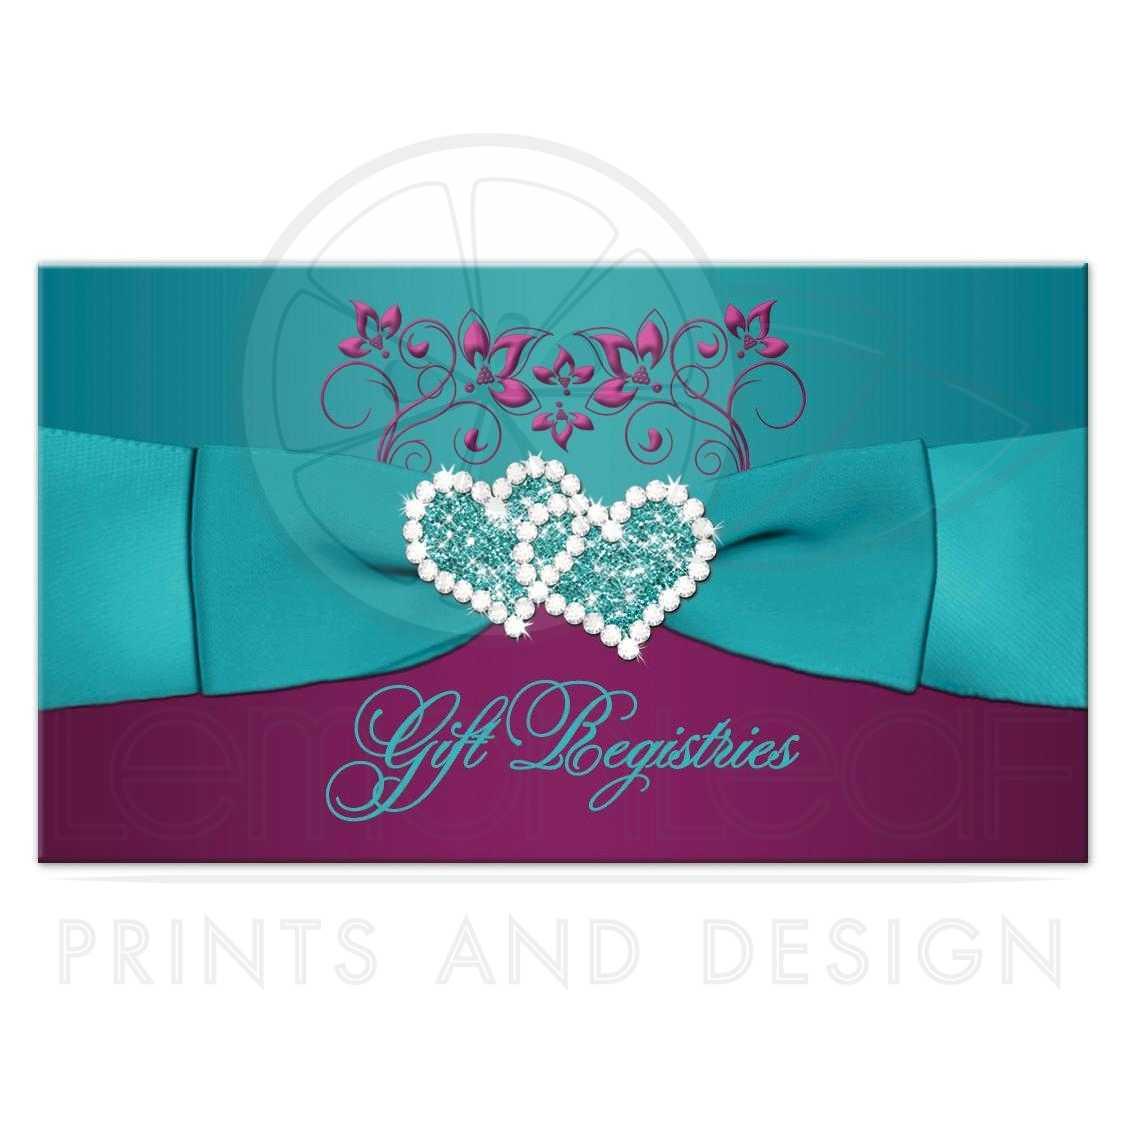 Wedding gift registry enclosure card printed ribbon jewels plum purple teal blue and magenta pink floral wedding gift registry or reception enclosure card junglespirit Images